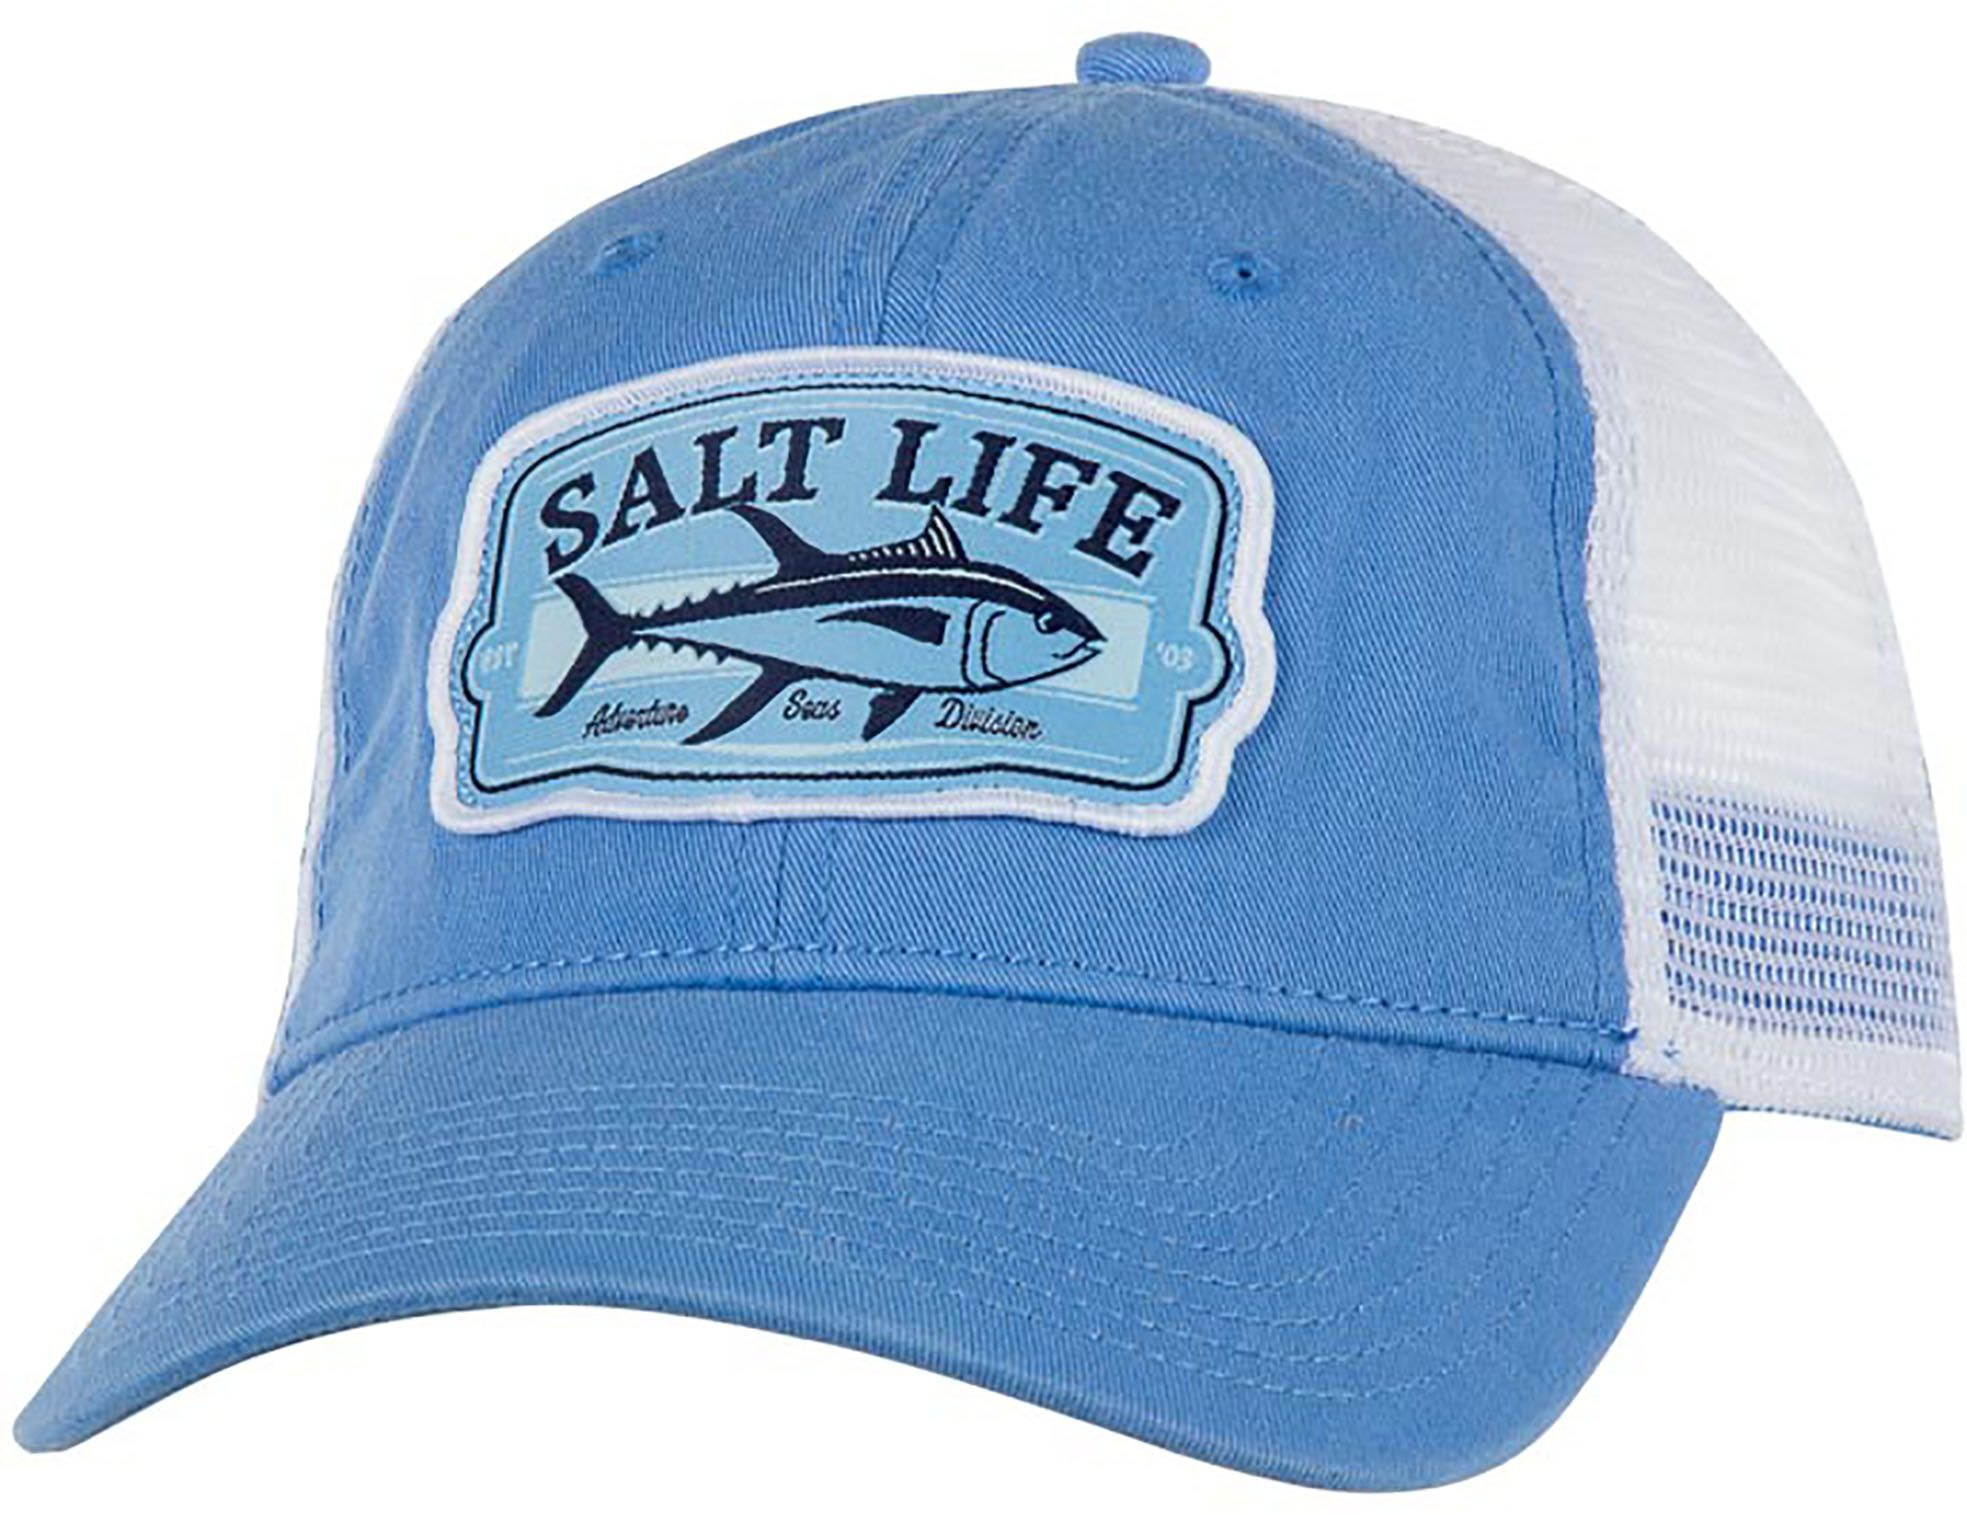 Salt Life Men's Tuna Badge Hat, Blue